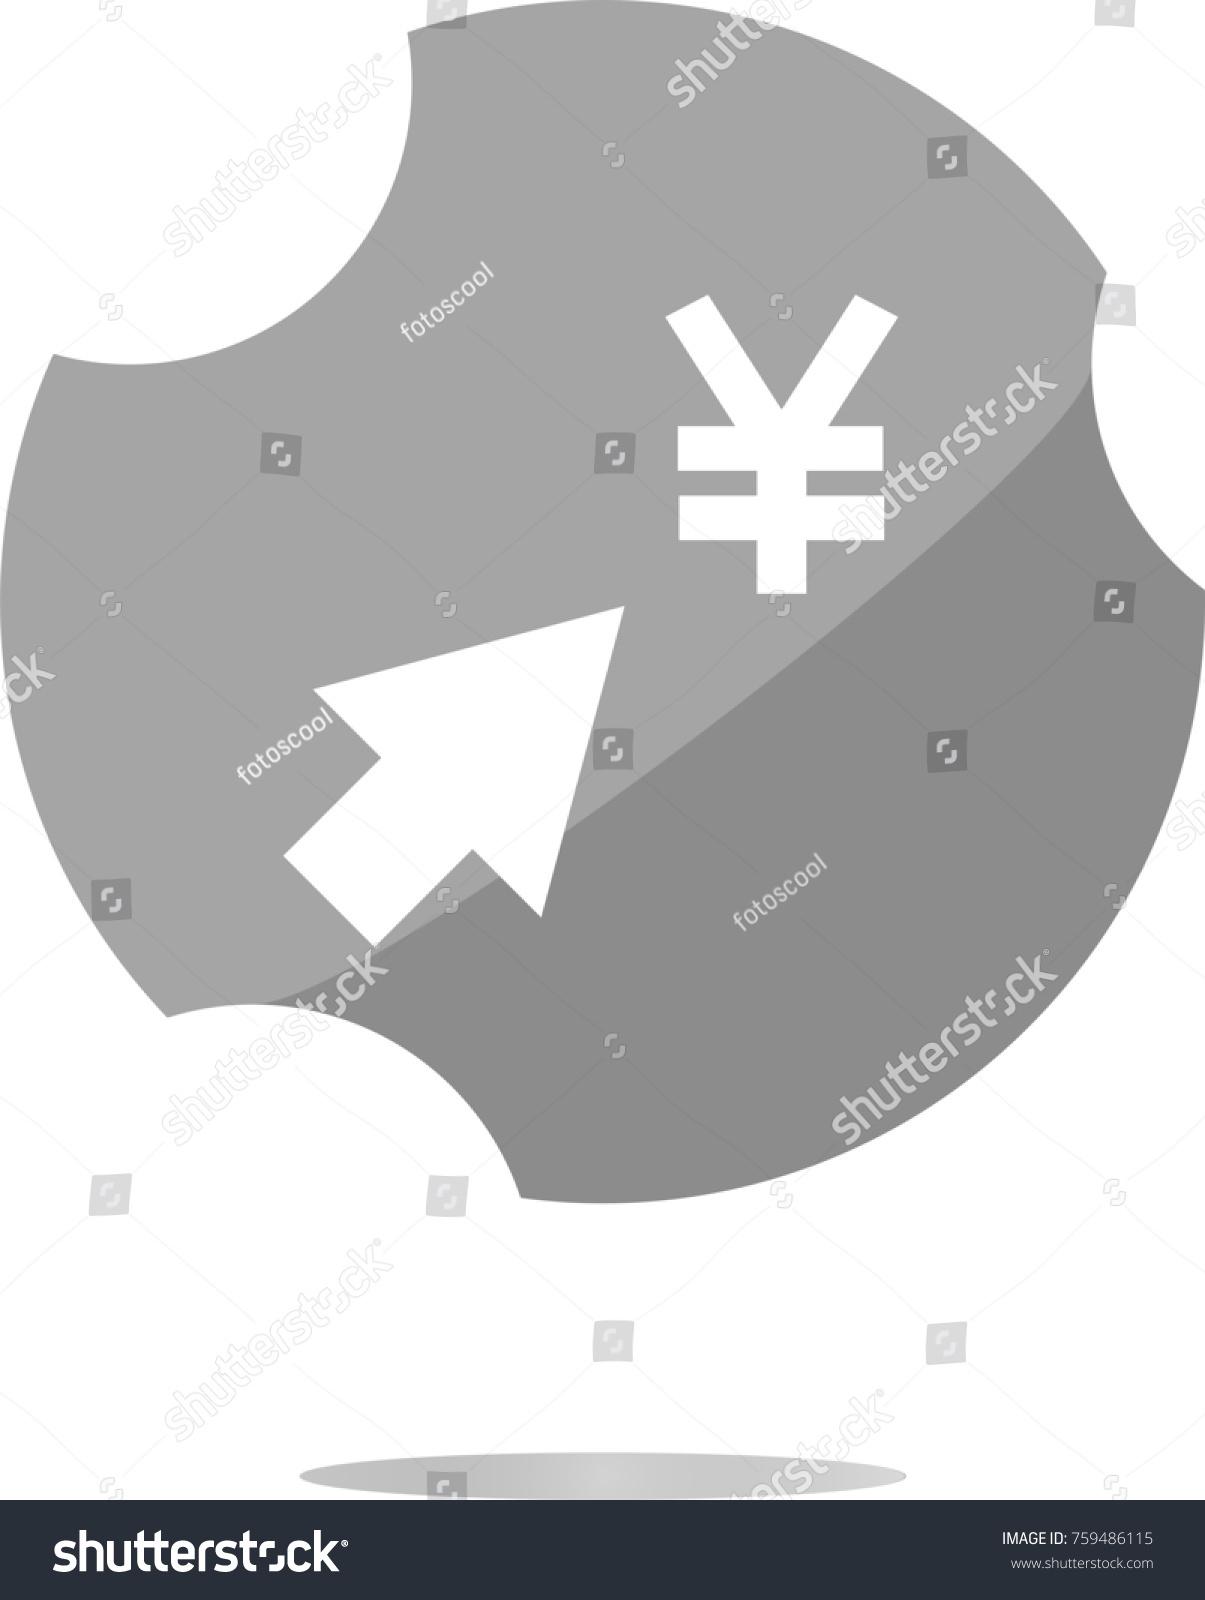 Yen currency symbol arrow web button stock illustration 759486115 yen currency symbol and arrow web button icon biocorpaavc